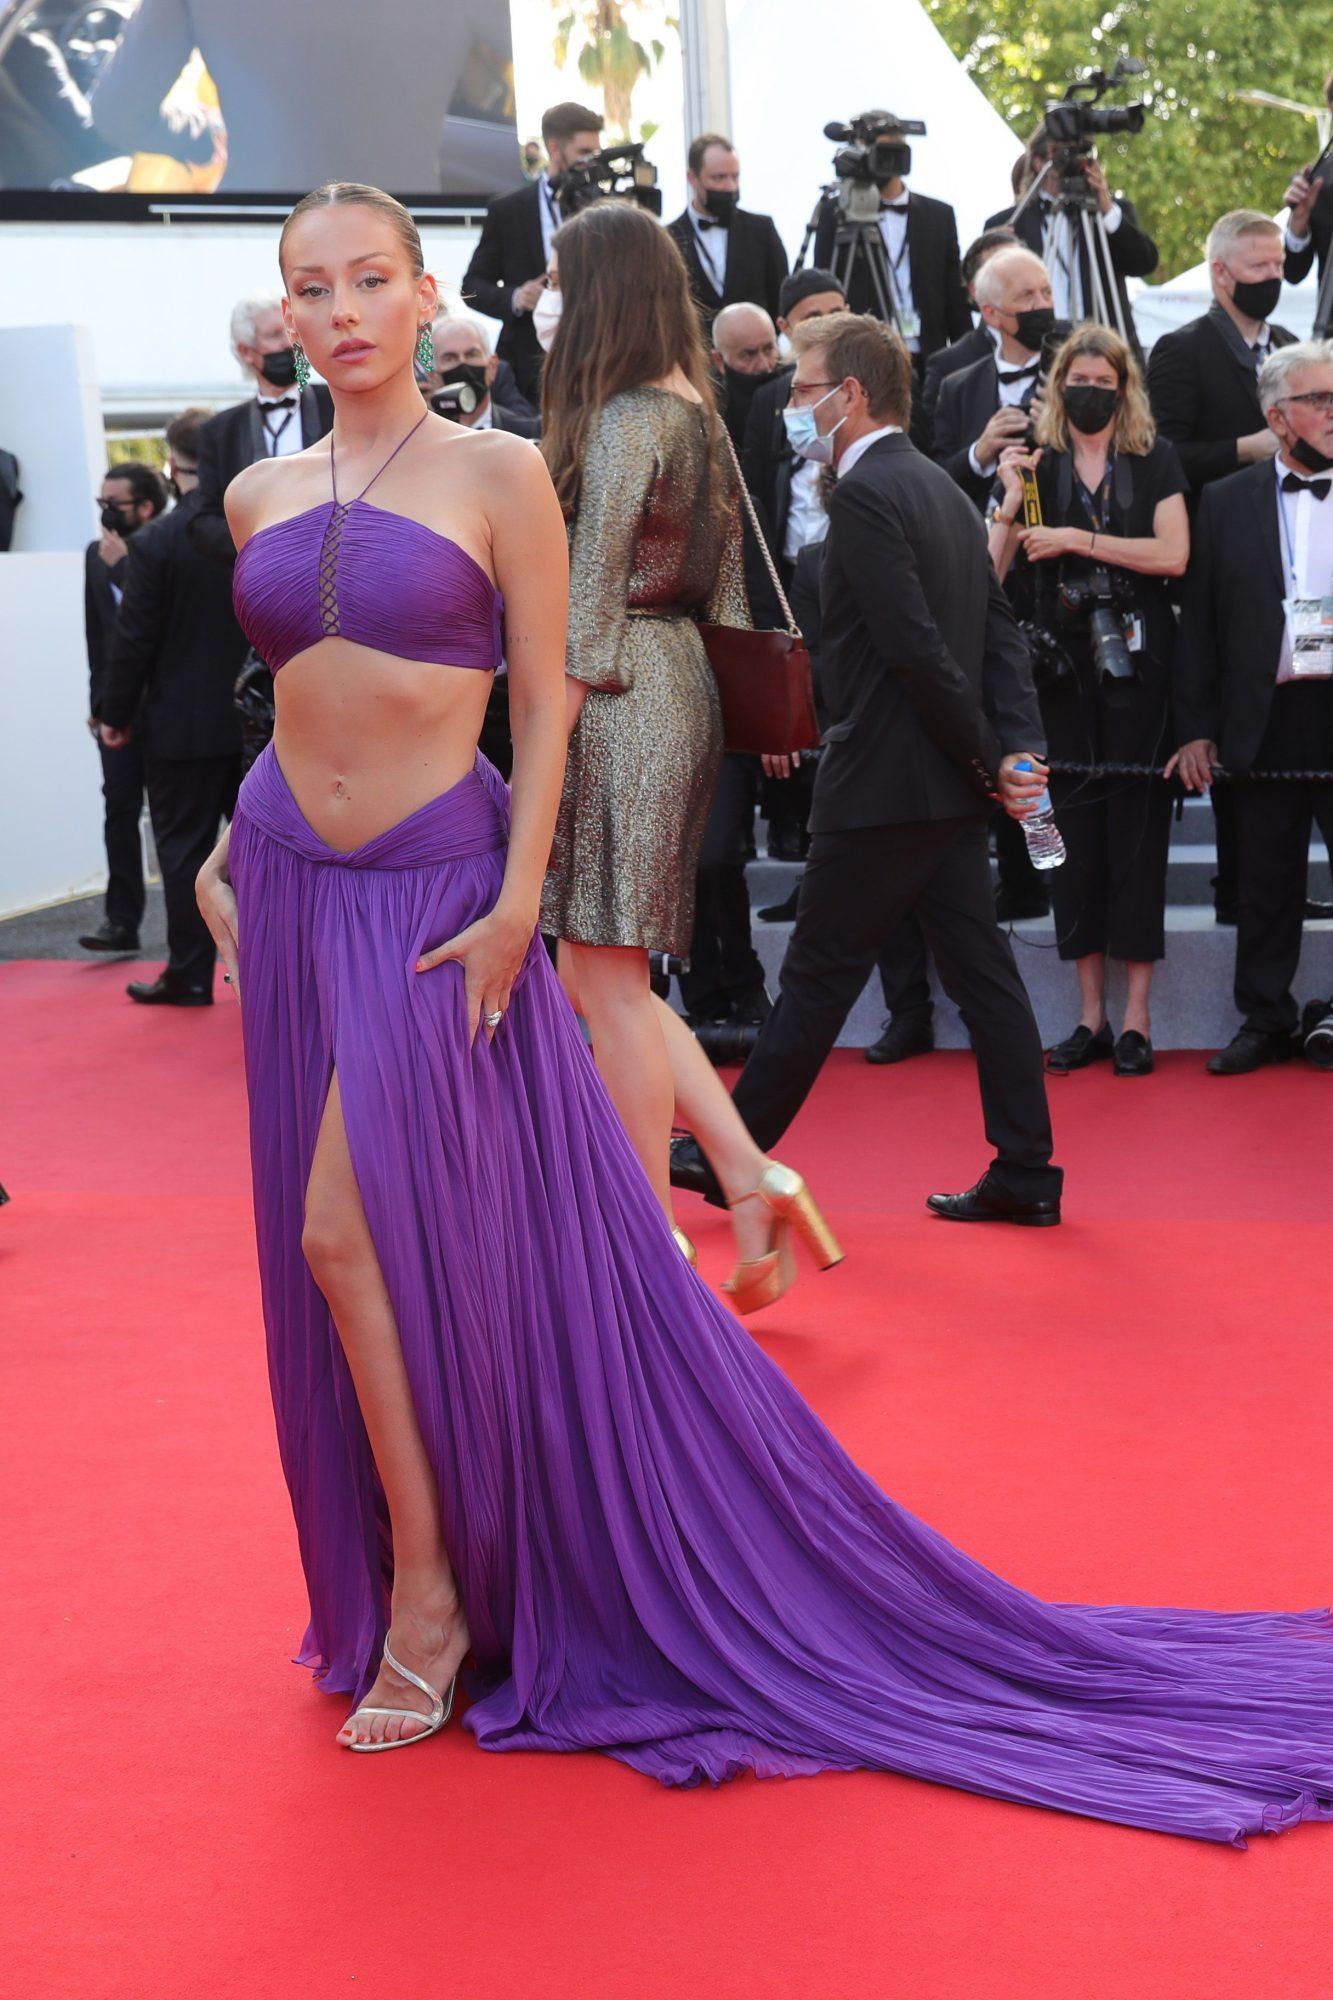 Festival de cine de Cannes alfombra roja, Ester Expósito